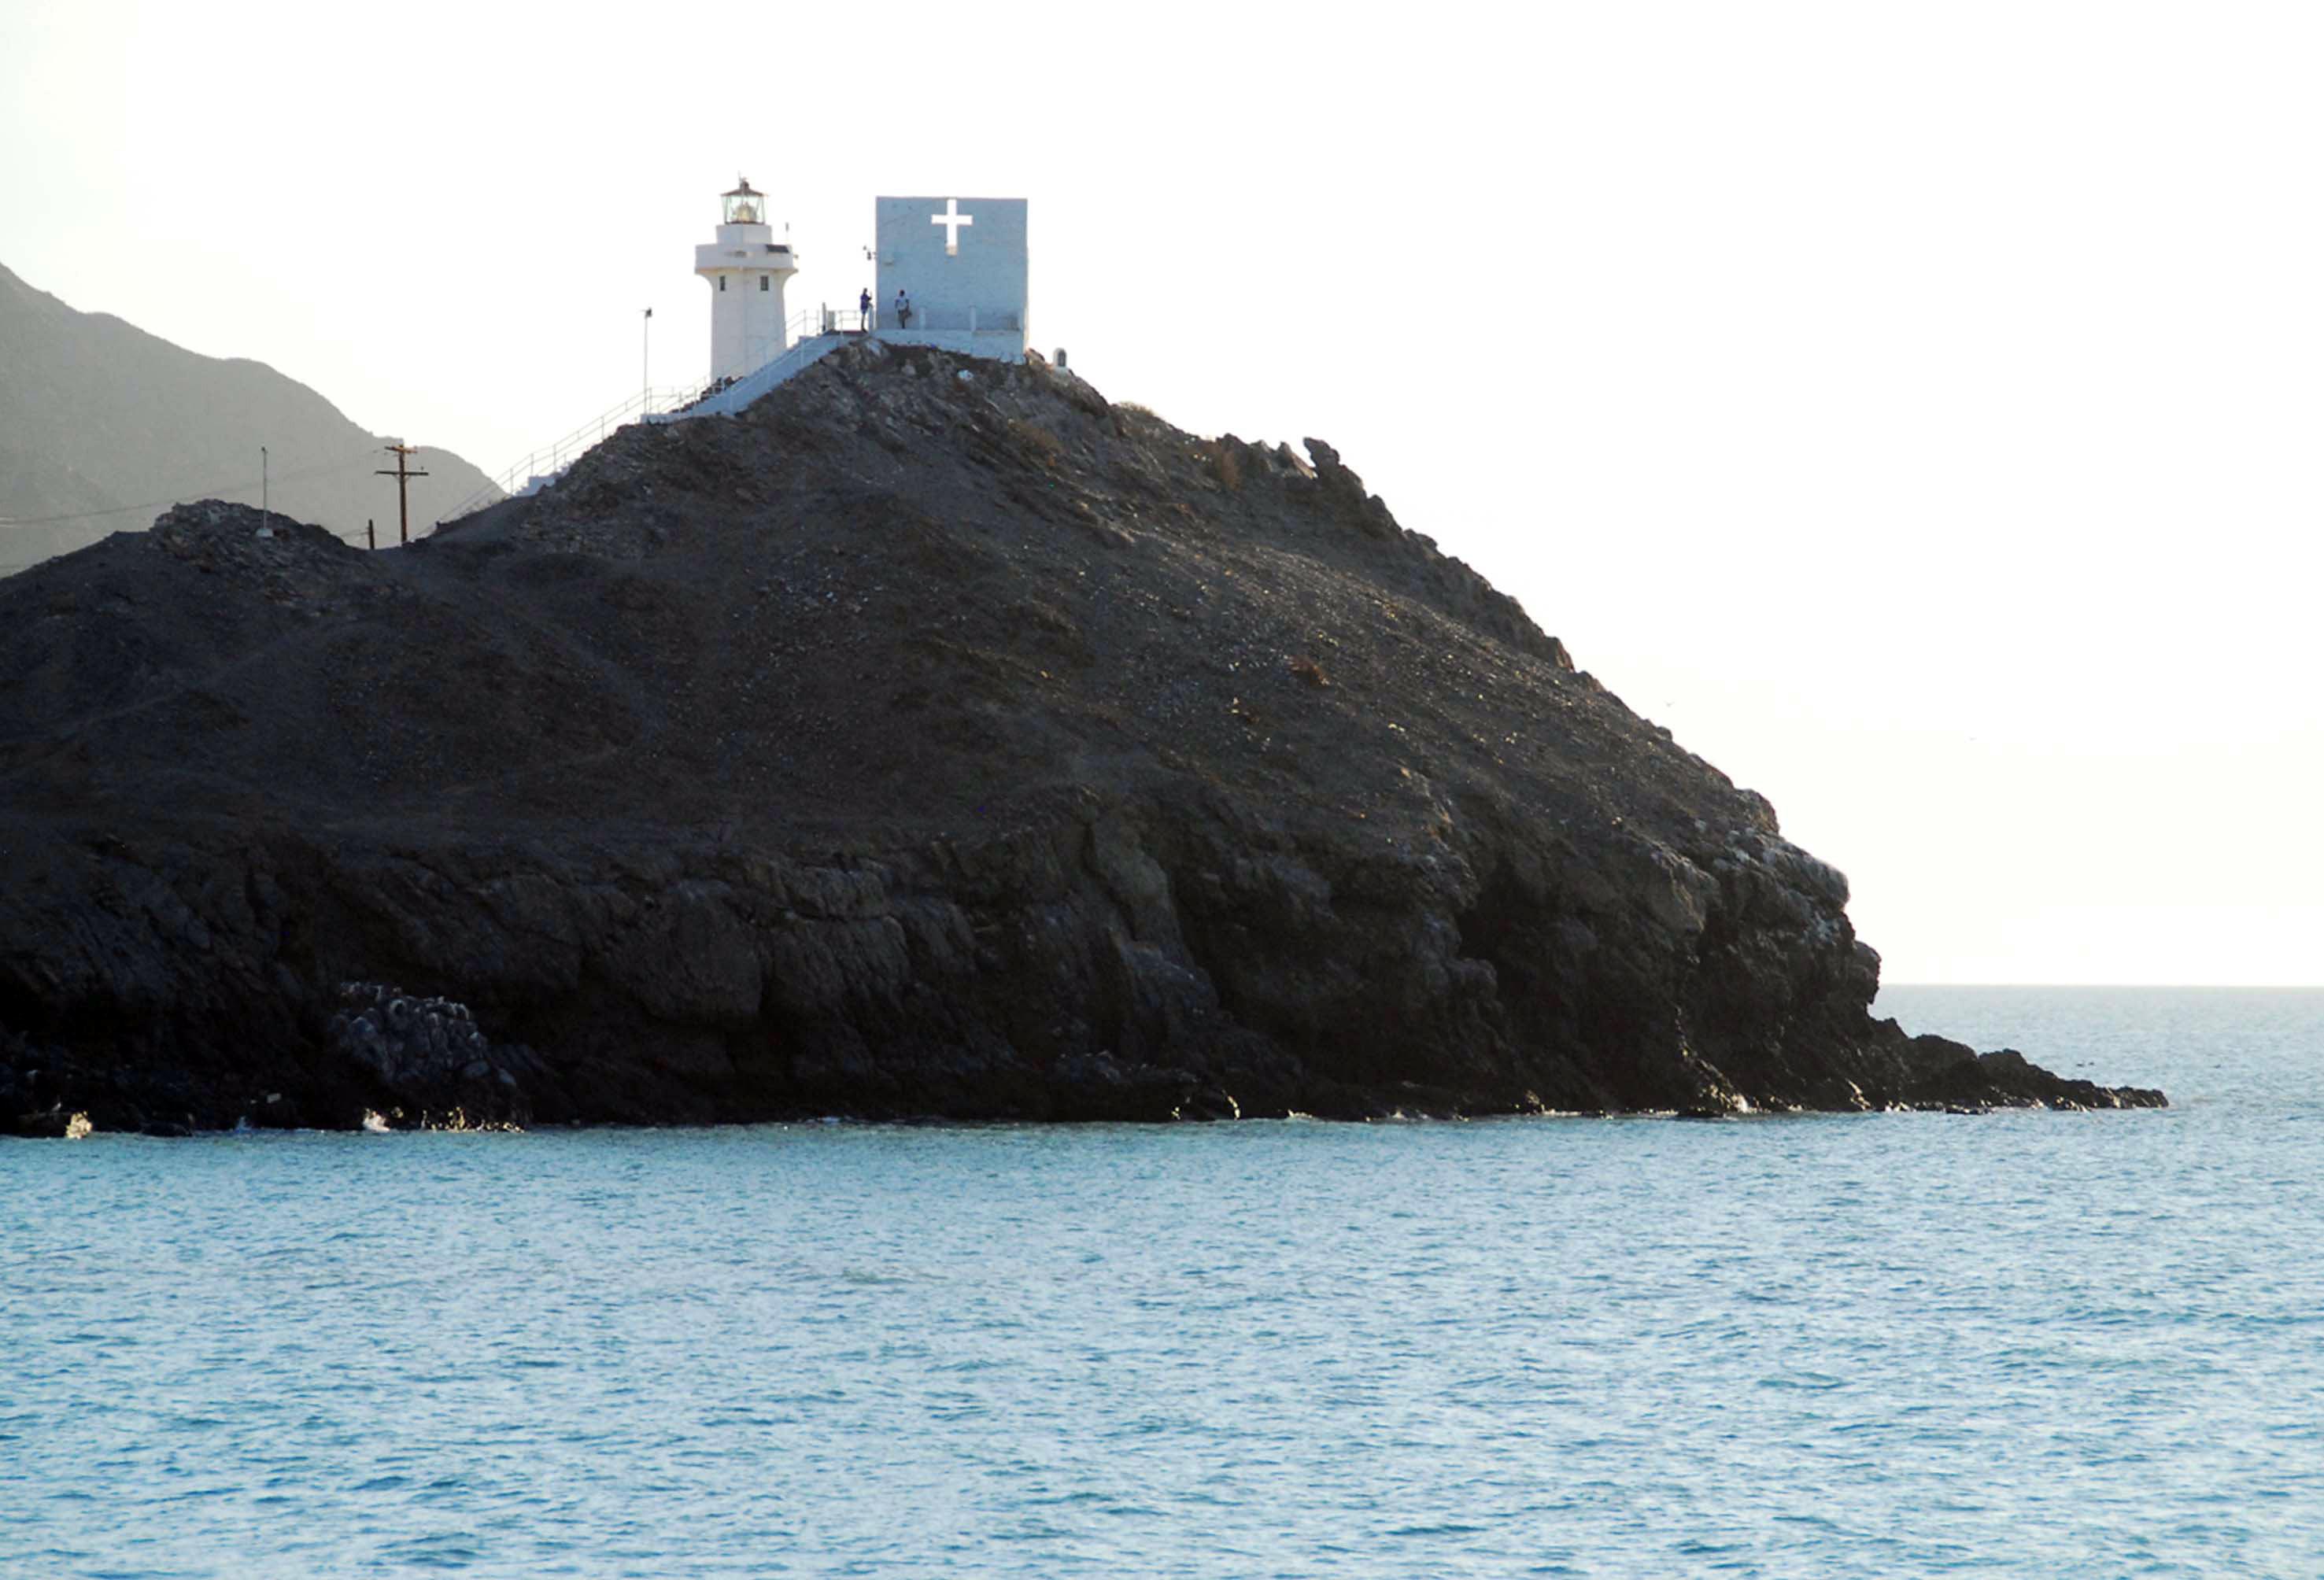 Mexico's Baja Sur resorts to start charging tourist tax